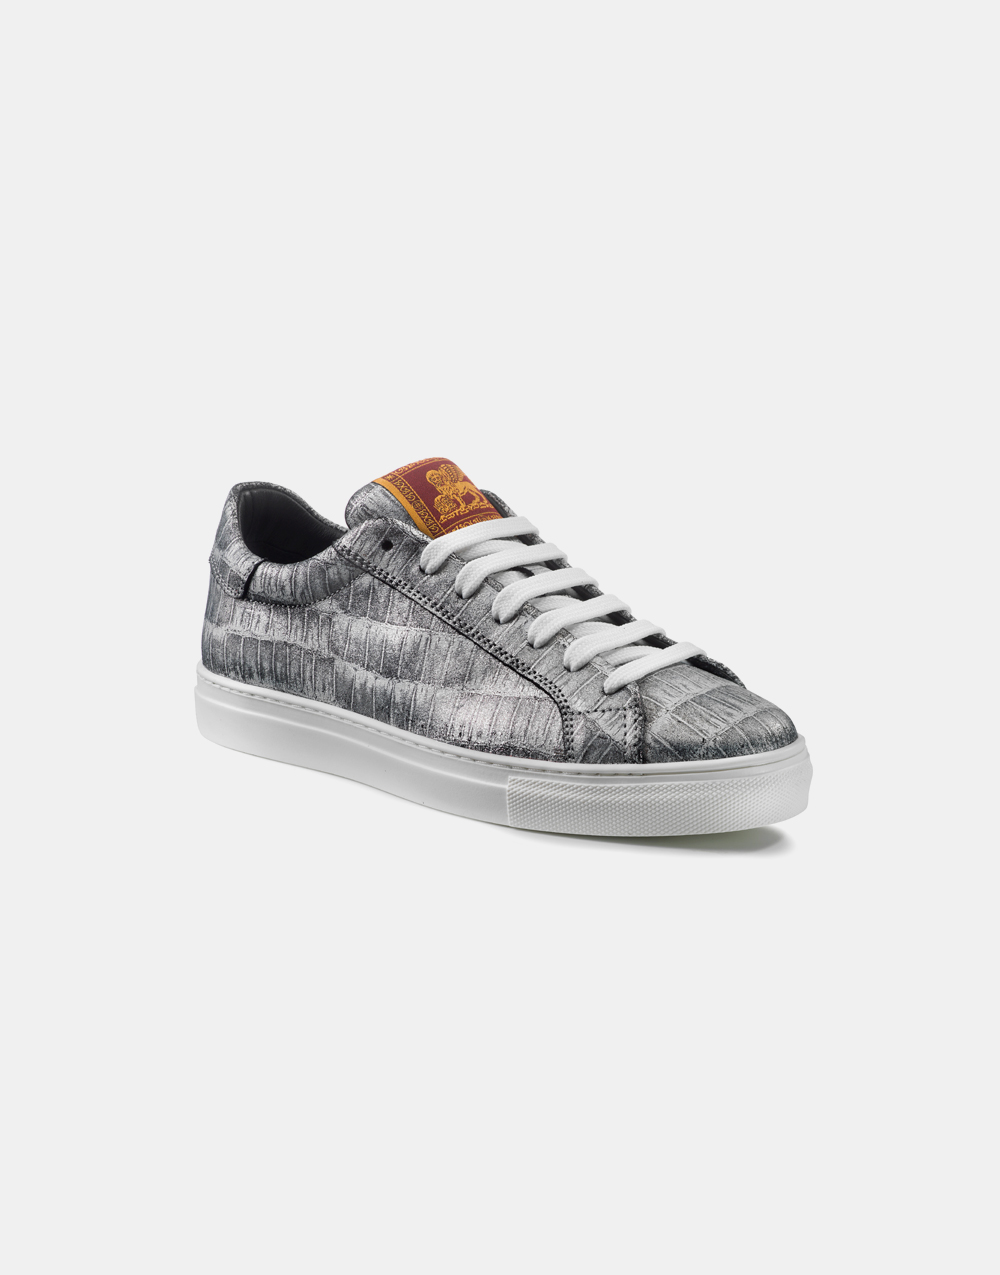 sneakers-veneto-doc-argento-bassa